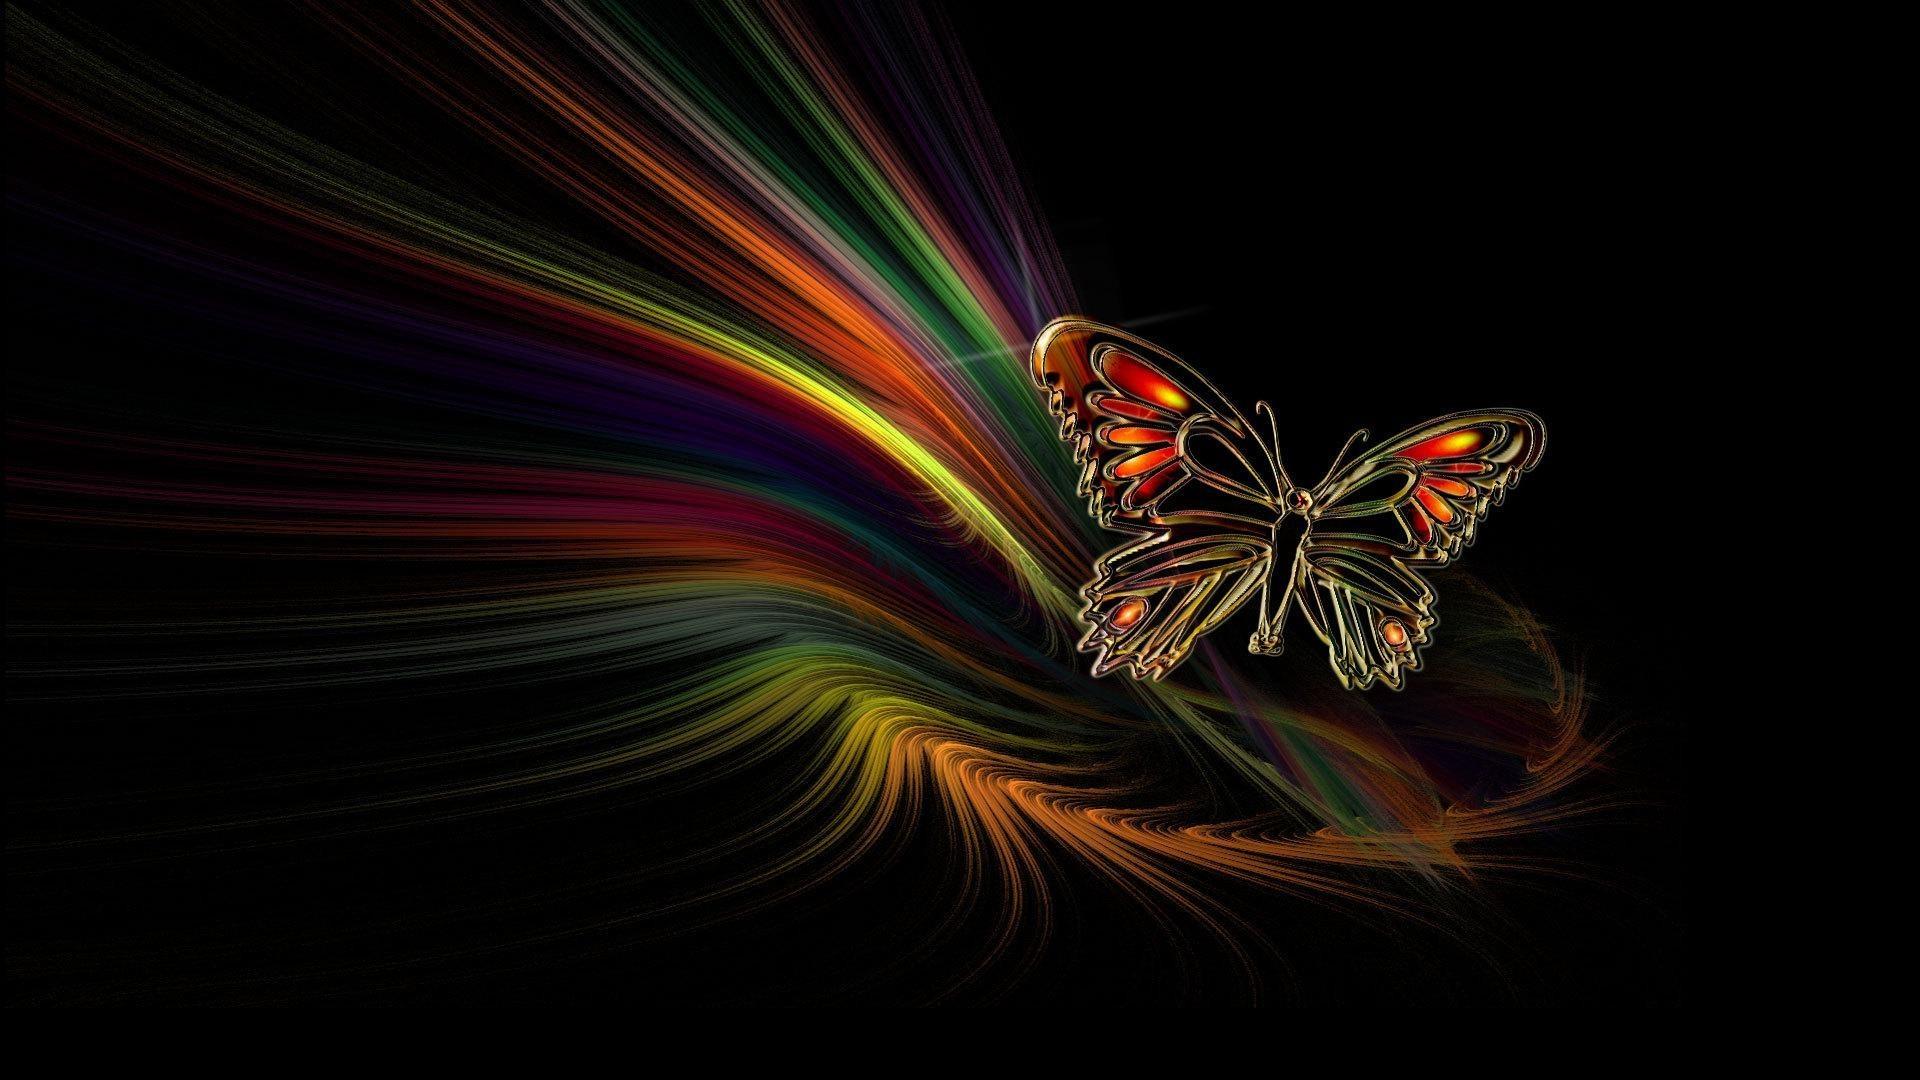 Animated Butterflies Wallpaper 0 HTML code. Butterfly Animated fond ecran hd